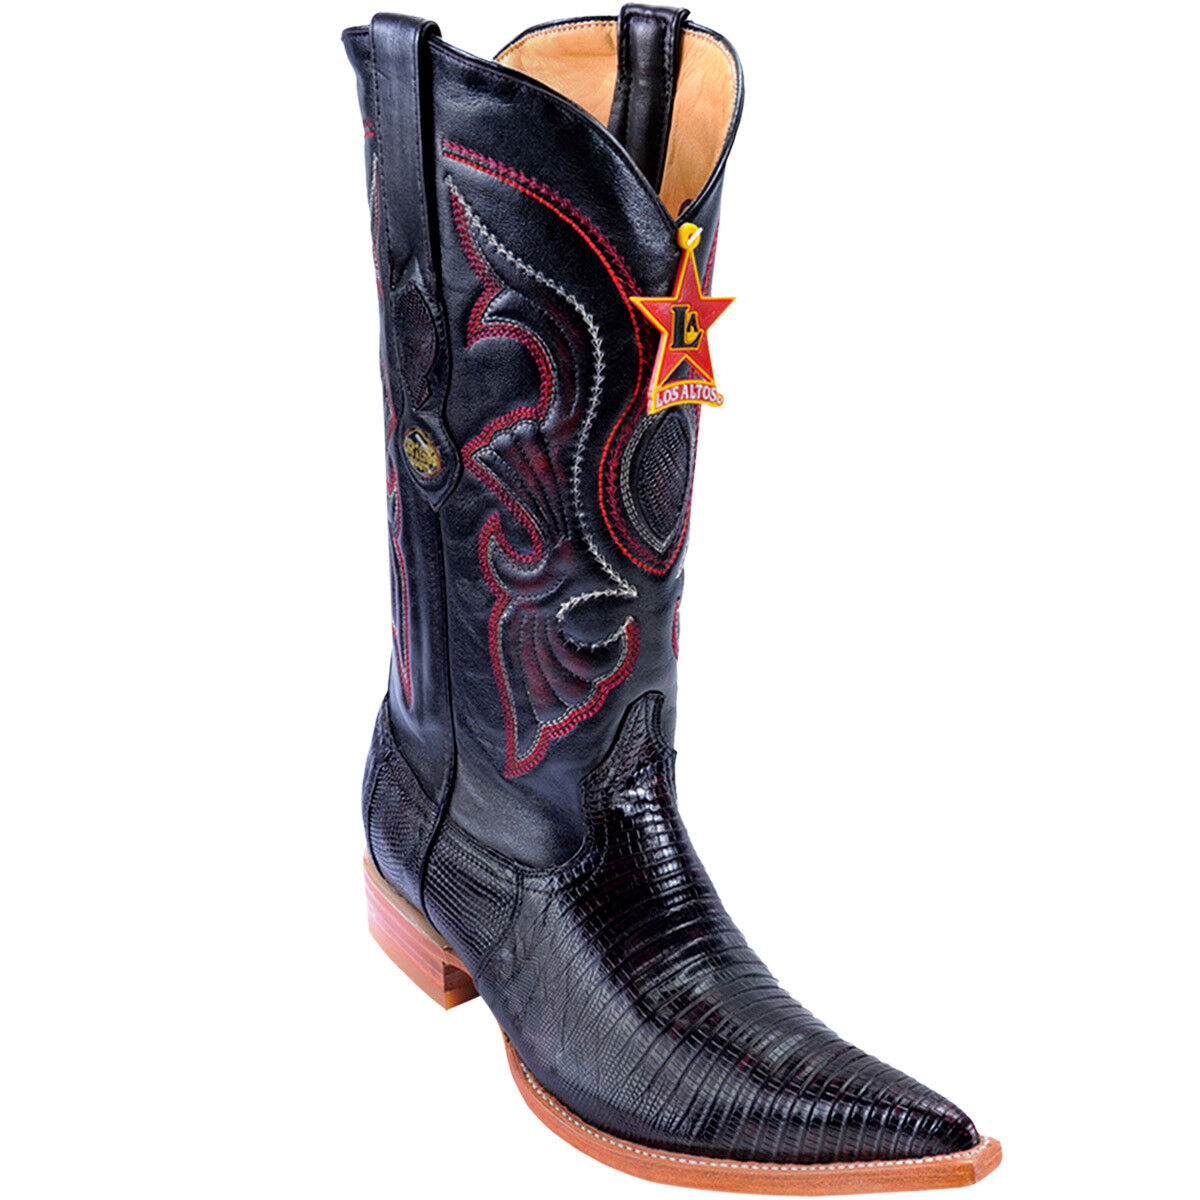 Men's Los Altos Genuine Teju Lizard Western Cowboy stivali 3x Pointy Toe Handmade